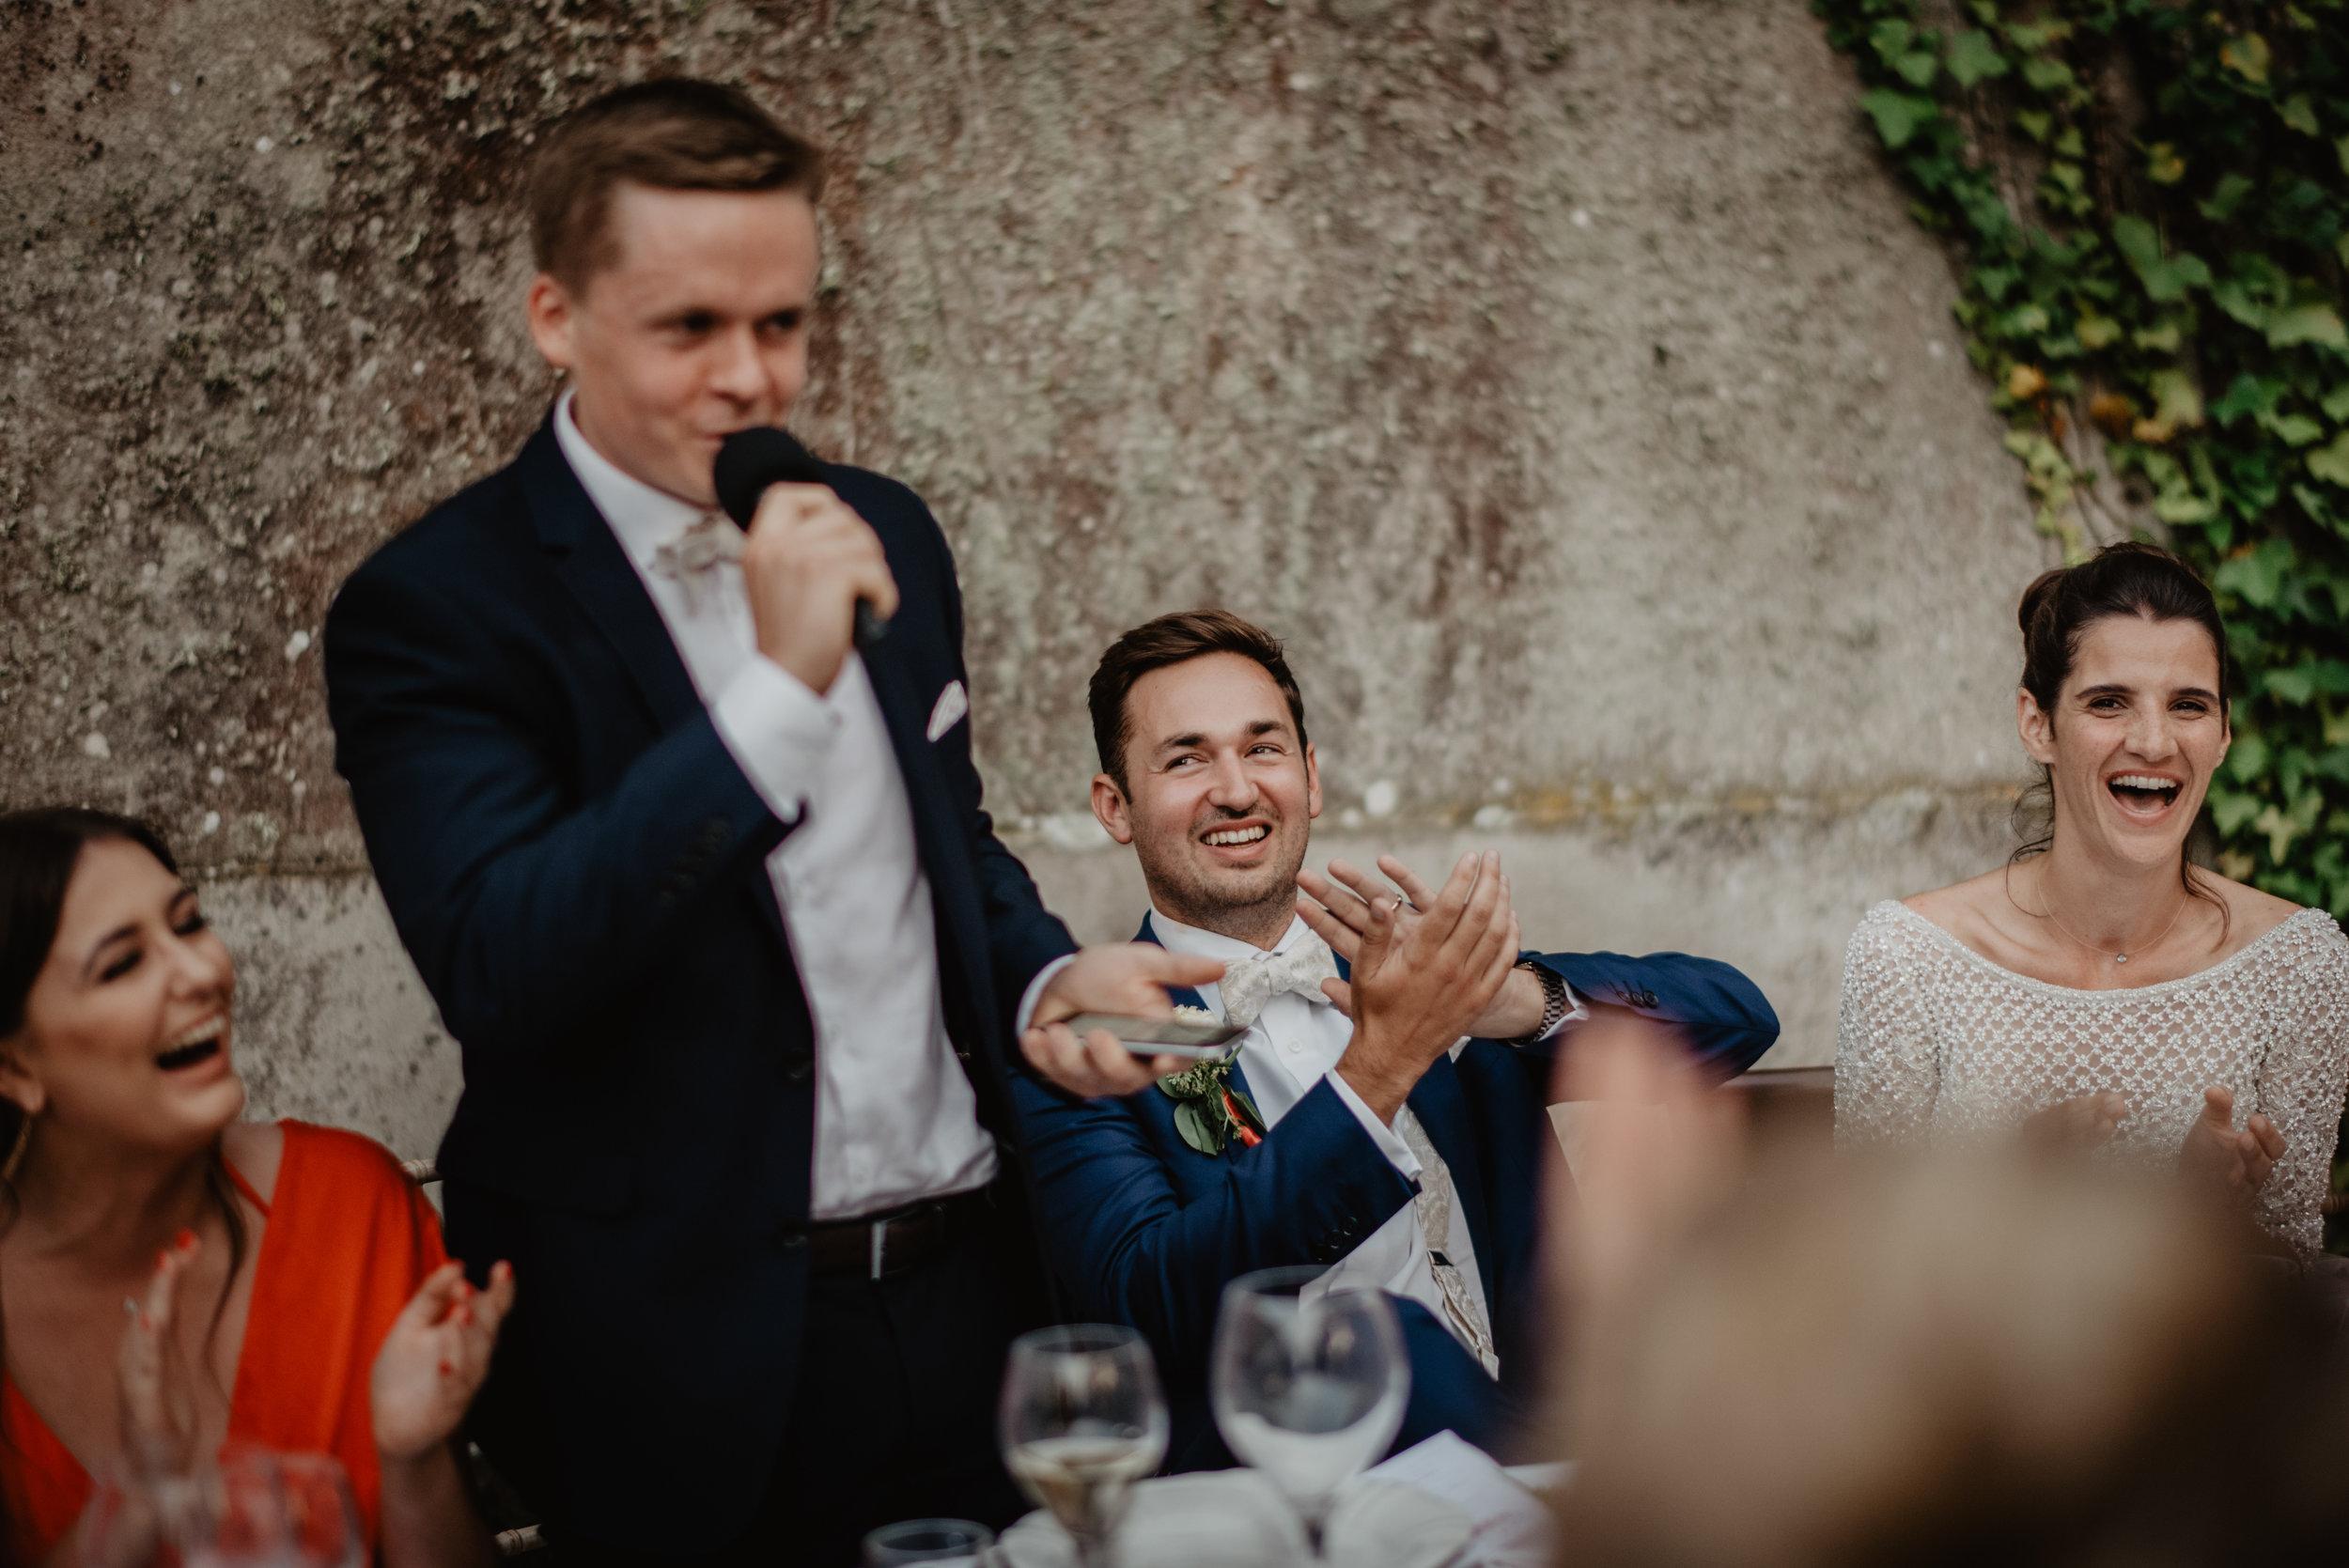 Lapela-photography-wedding-sintra-portugal-117.jpg